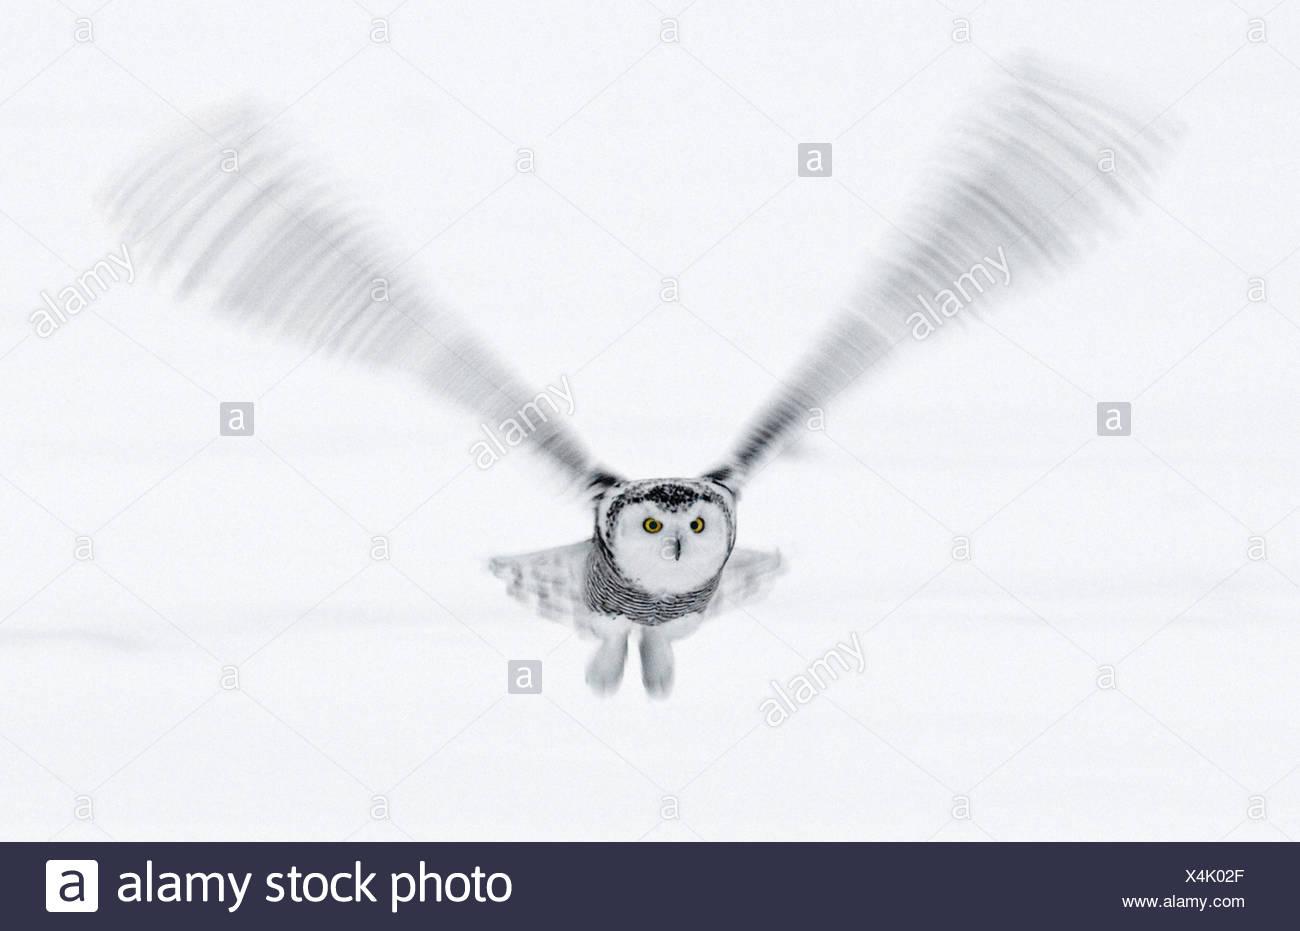 Snowy Owl in flight, Ottawa, Canada Stock Photo